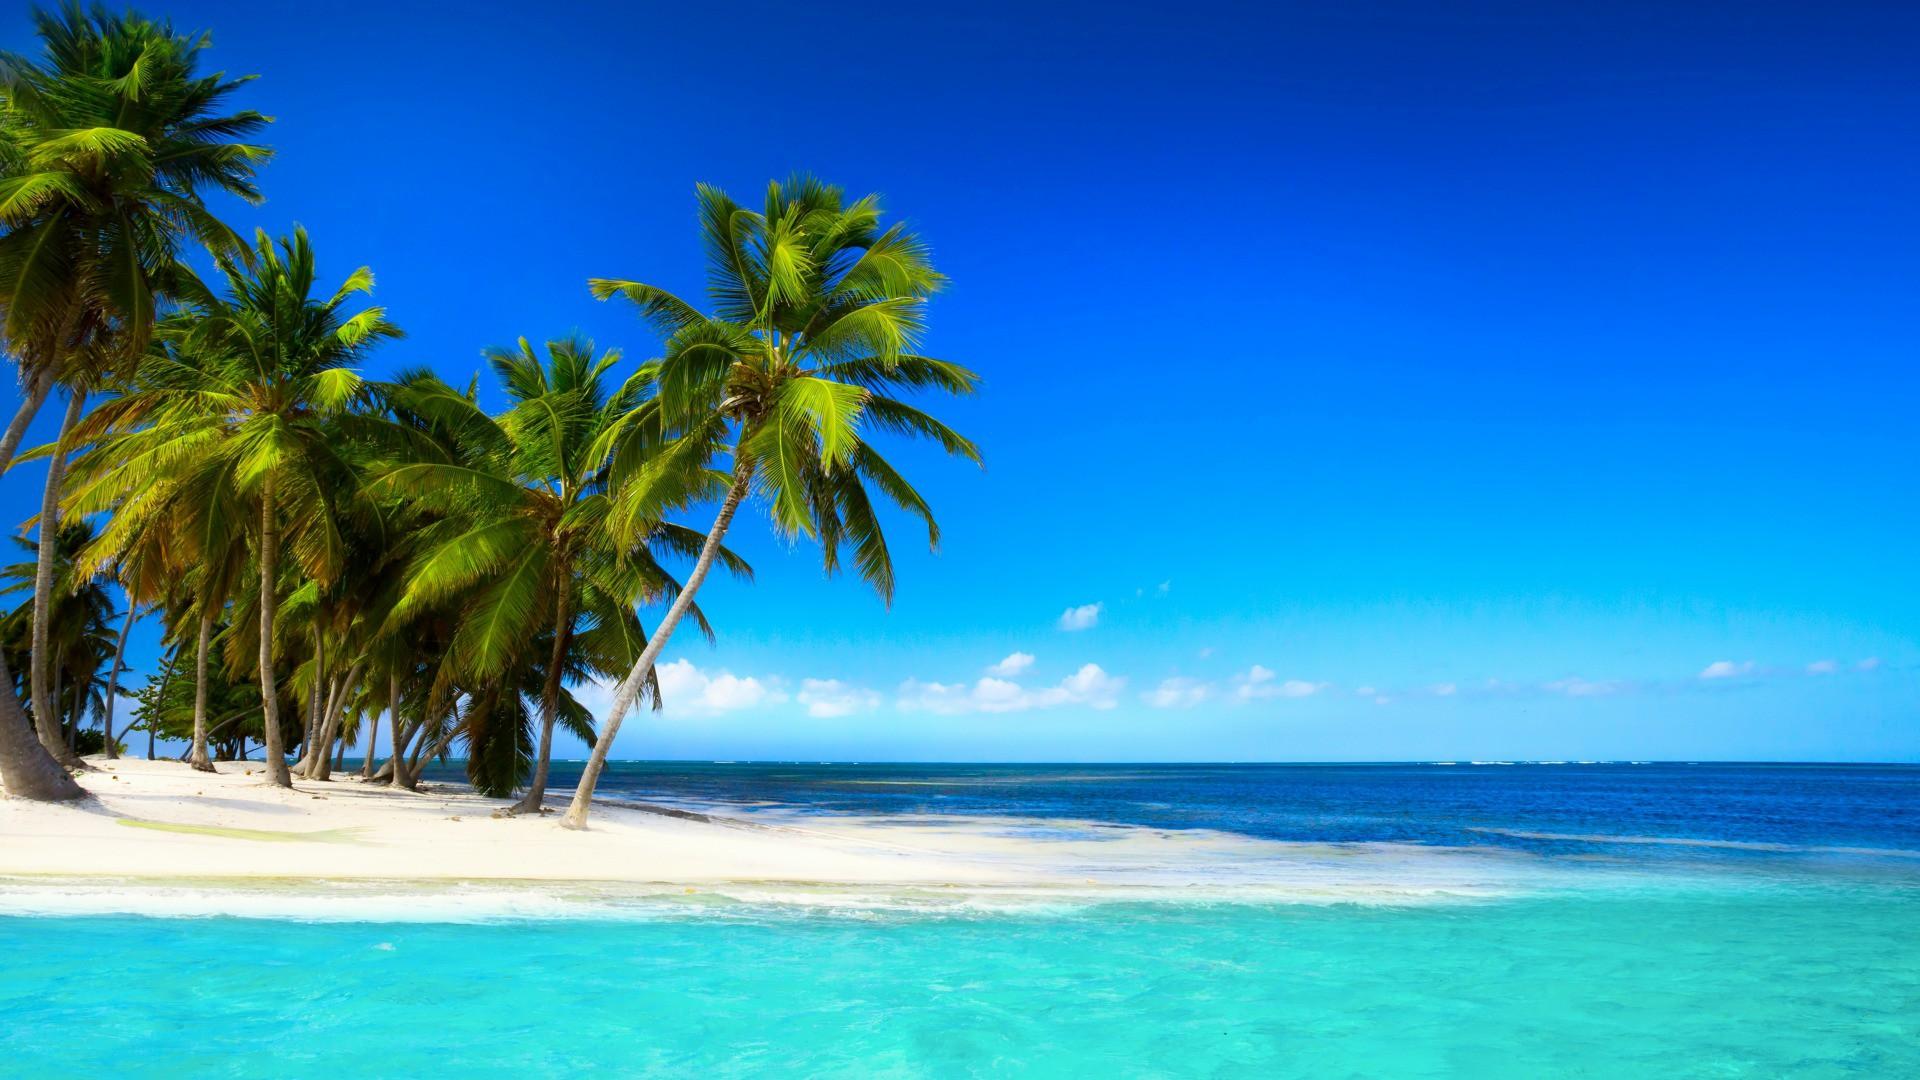 Tropical Beach With Palm Trees Beautiful Sky Blue Sea - Tropical Beaches With Palm Trees - HD Wallpaper